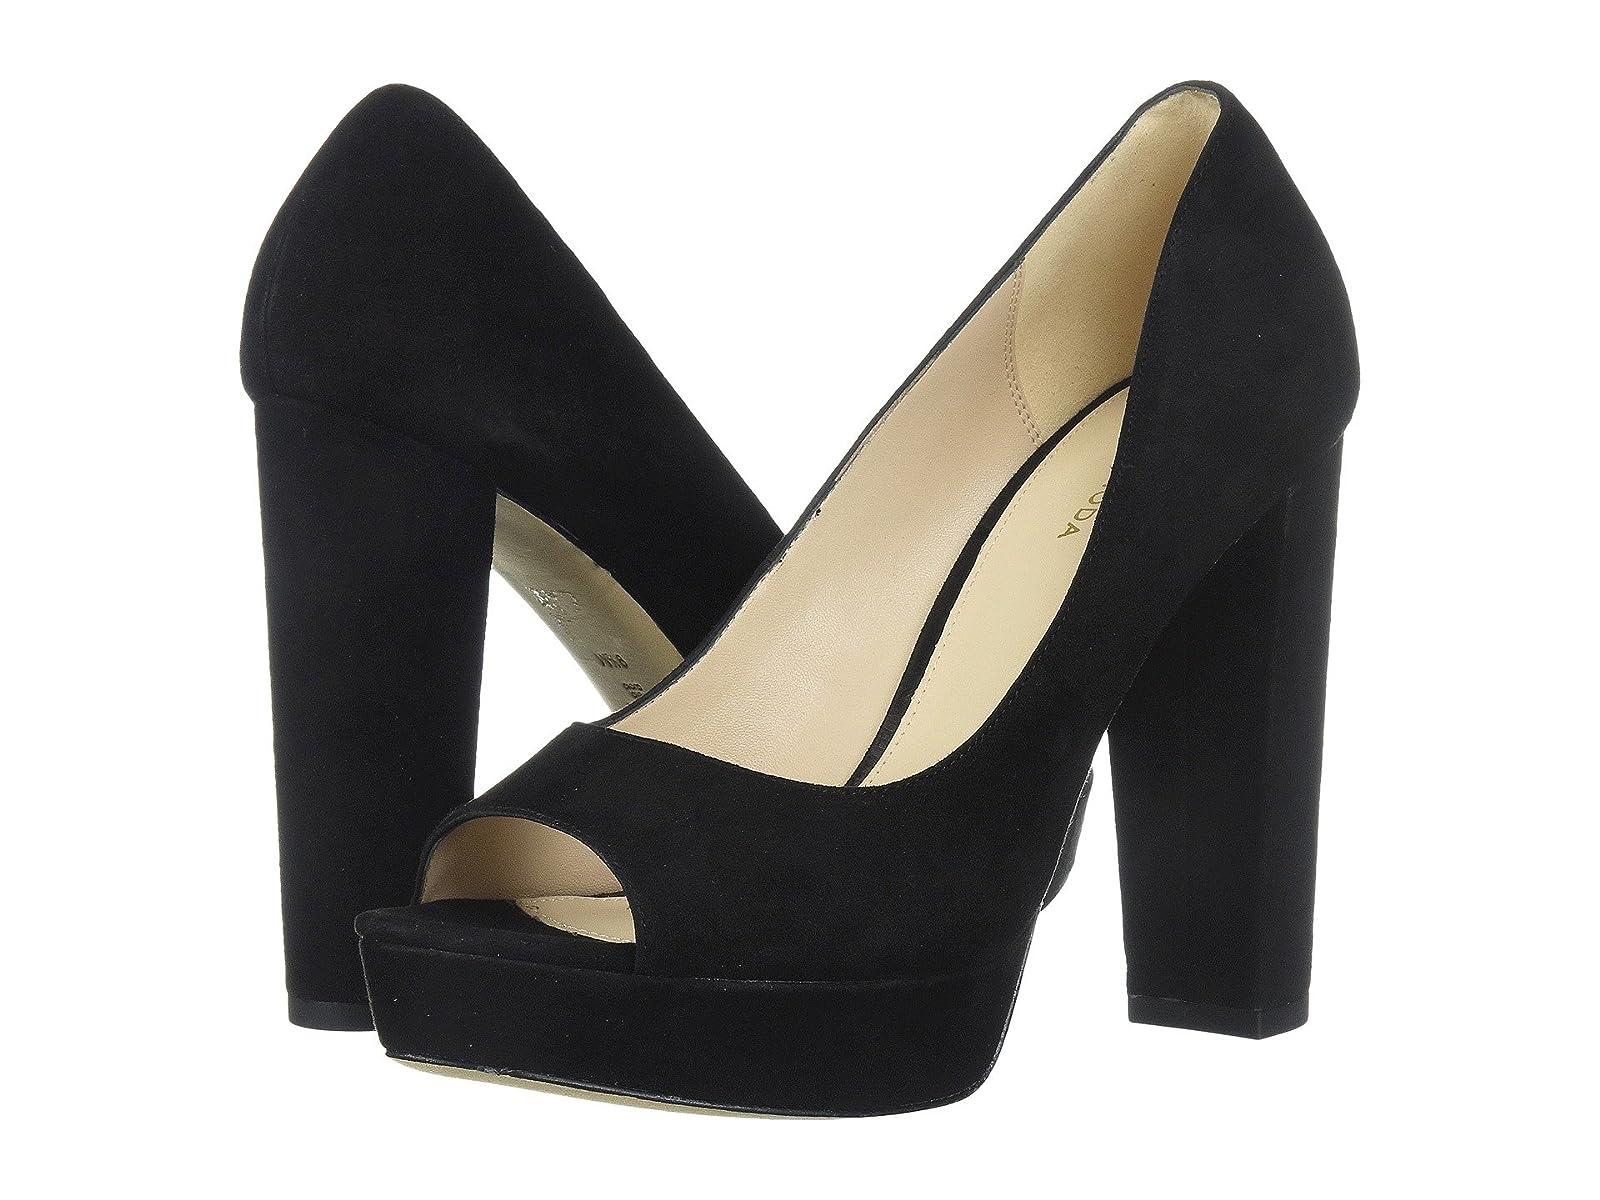 Pelle Moda Paris 2Cheap and distinctive eye-catching shoes